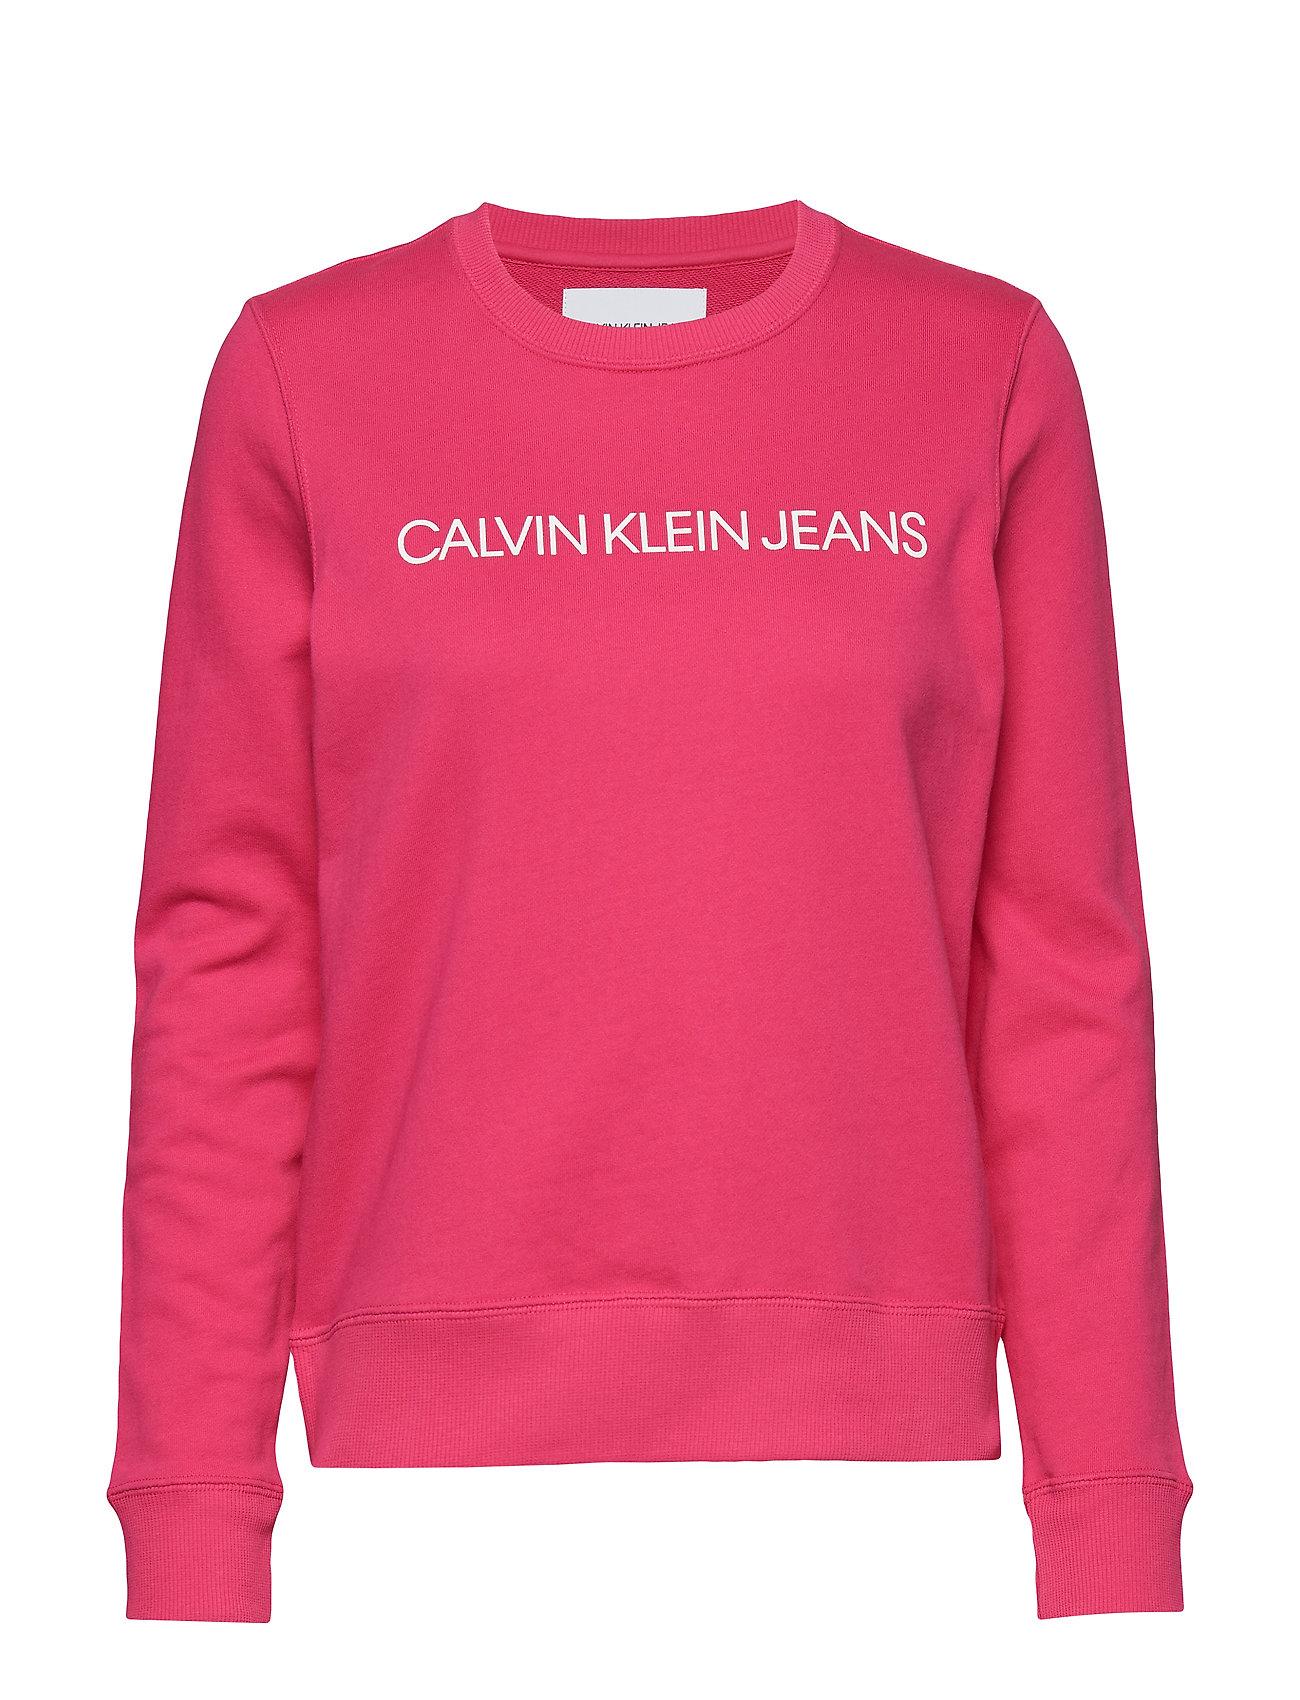 Calvin Klein Jeans INSTITUTIONAL REGULA - CABARET